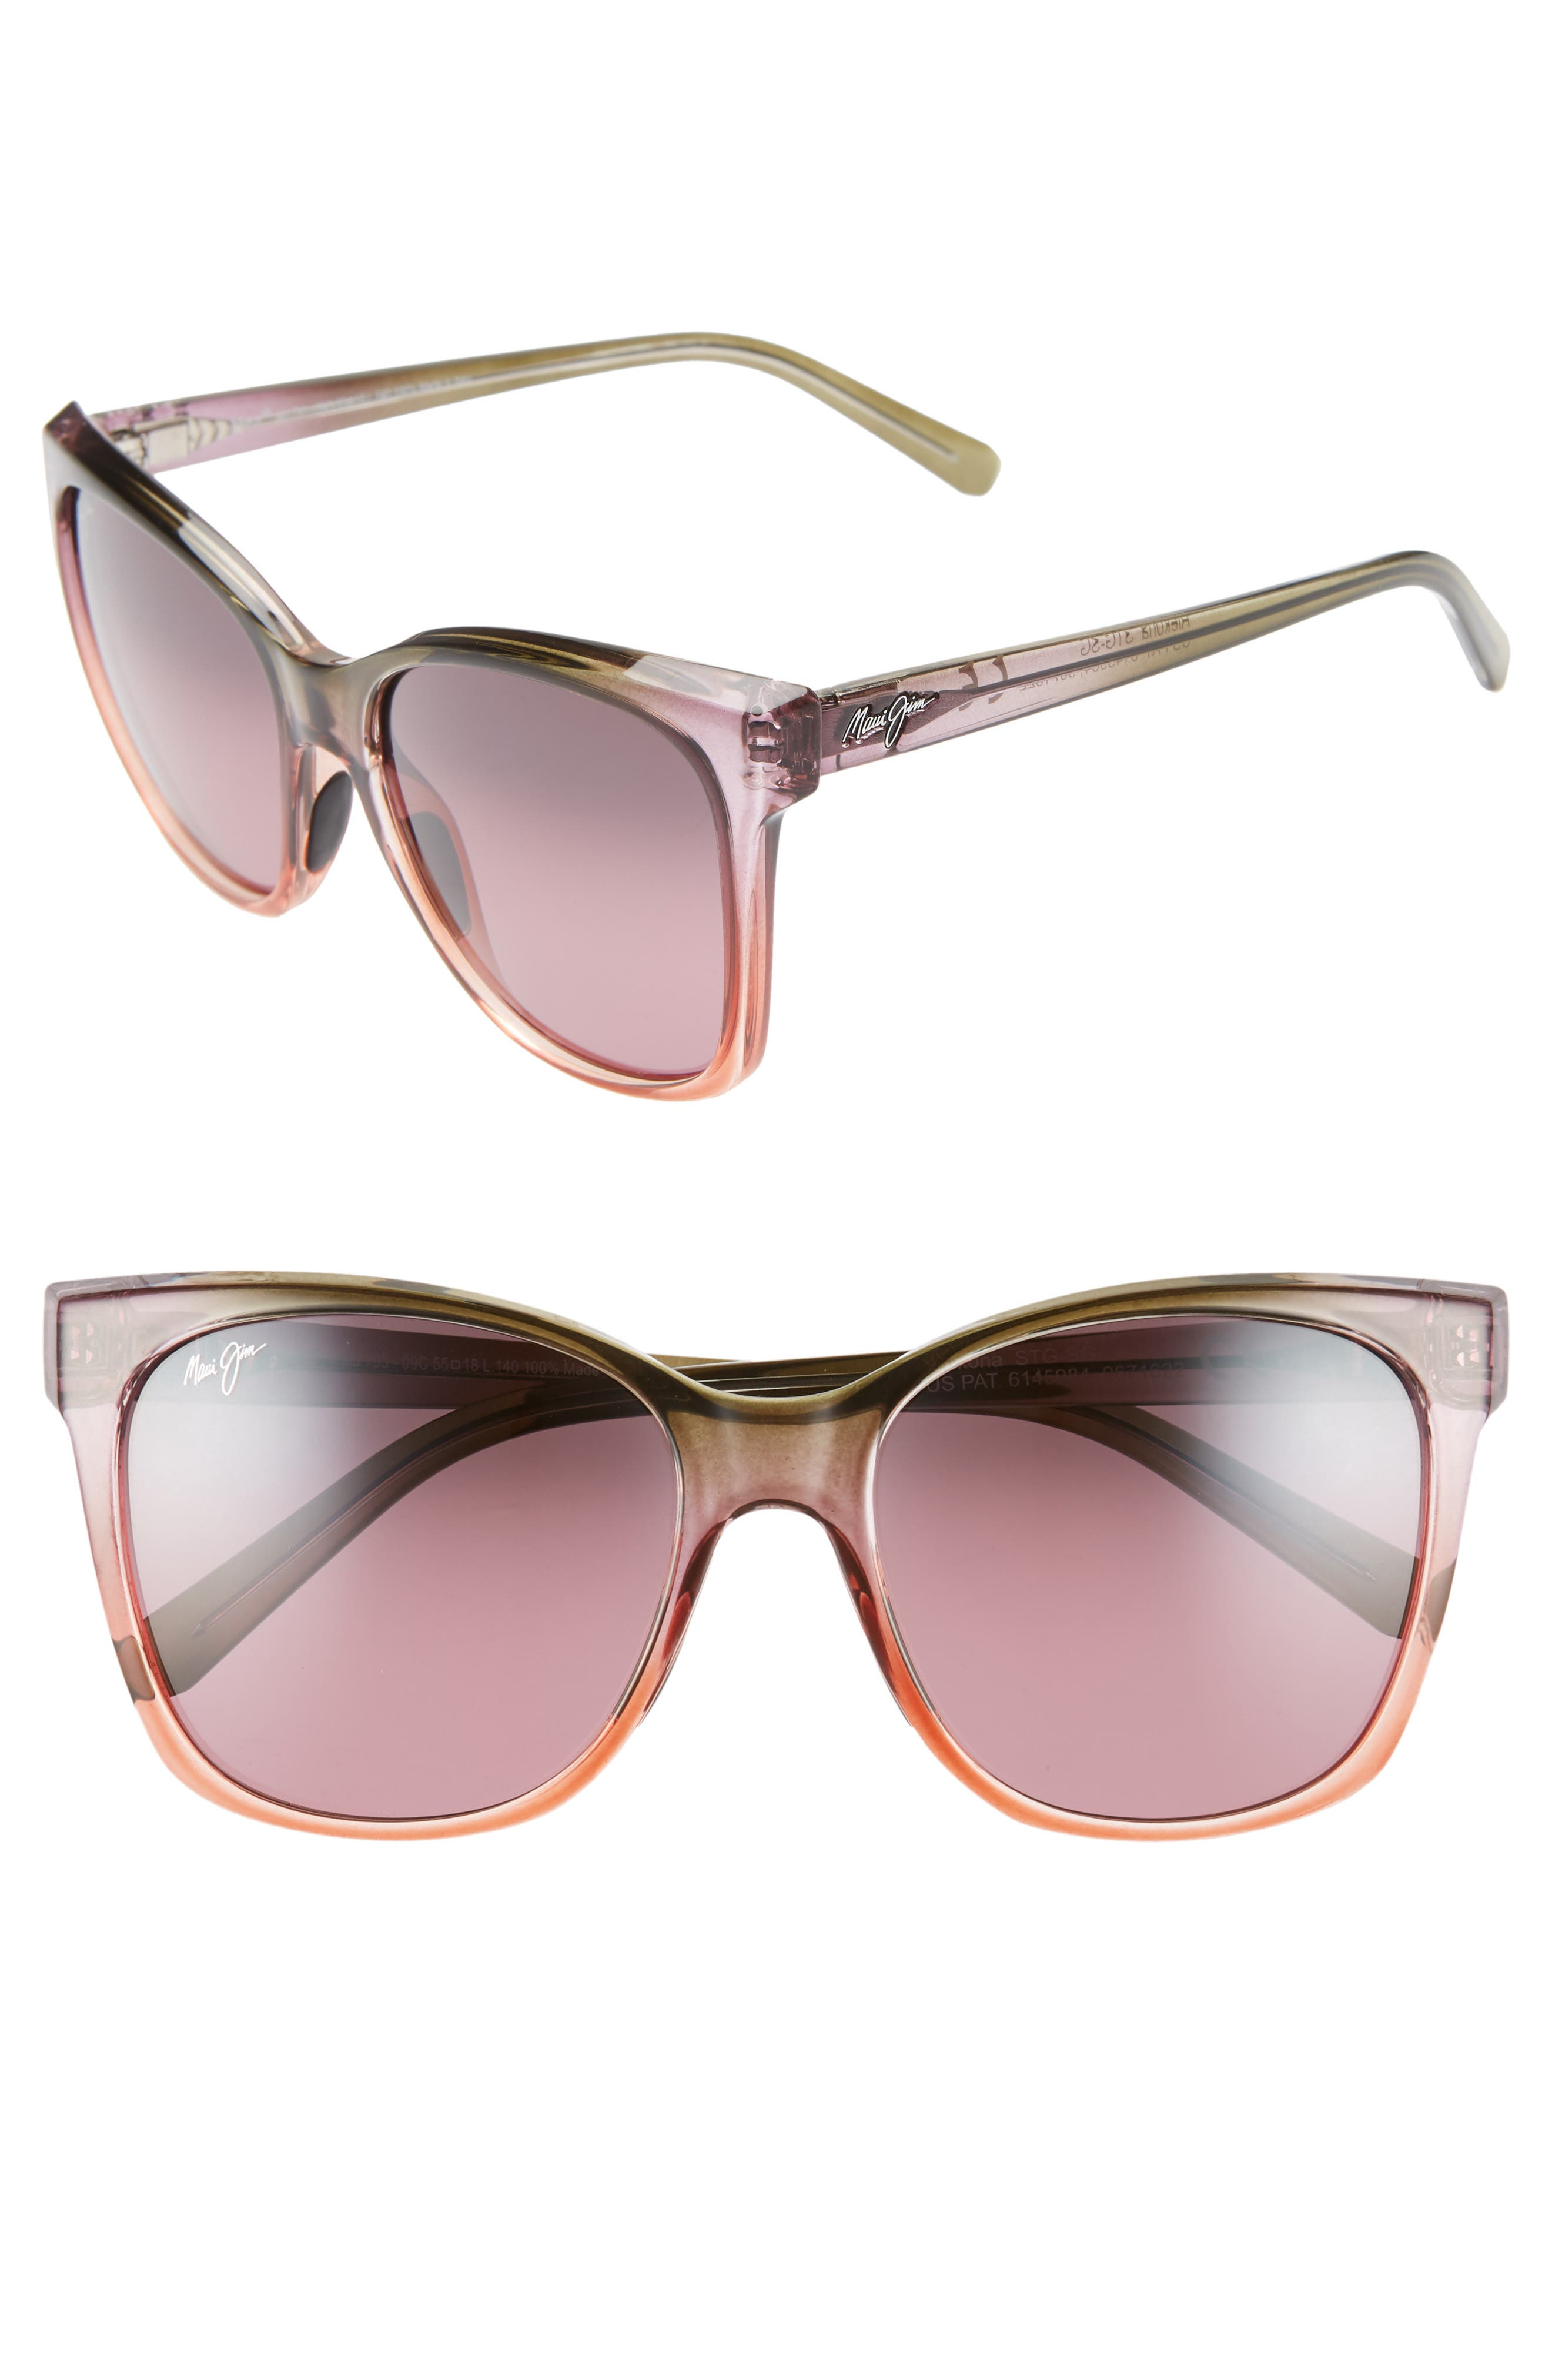 Maui Jim Alekona 55Mm Sunglasses - Blush/ Mossy/ Peach